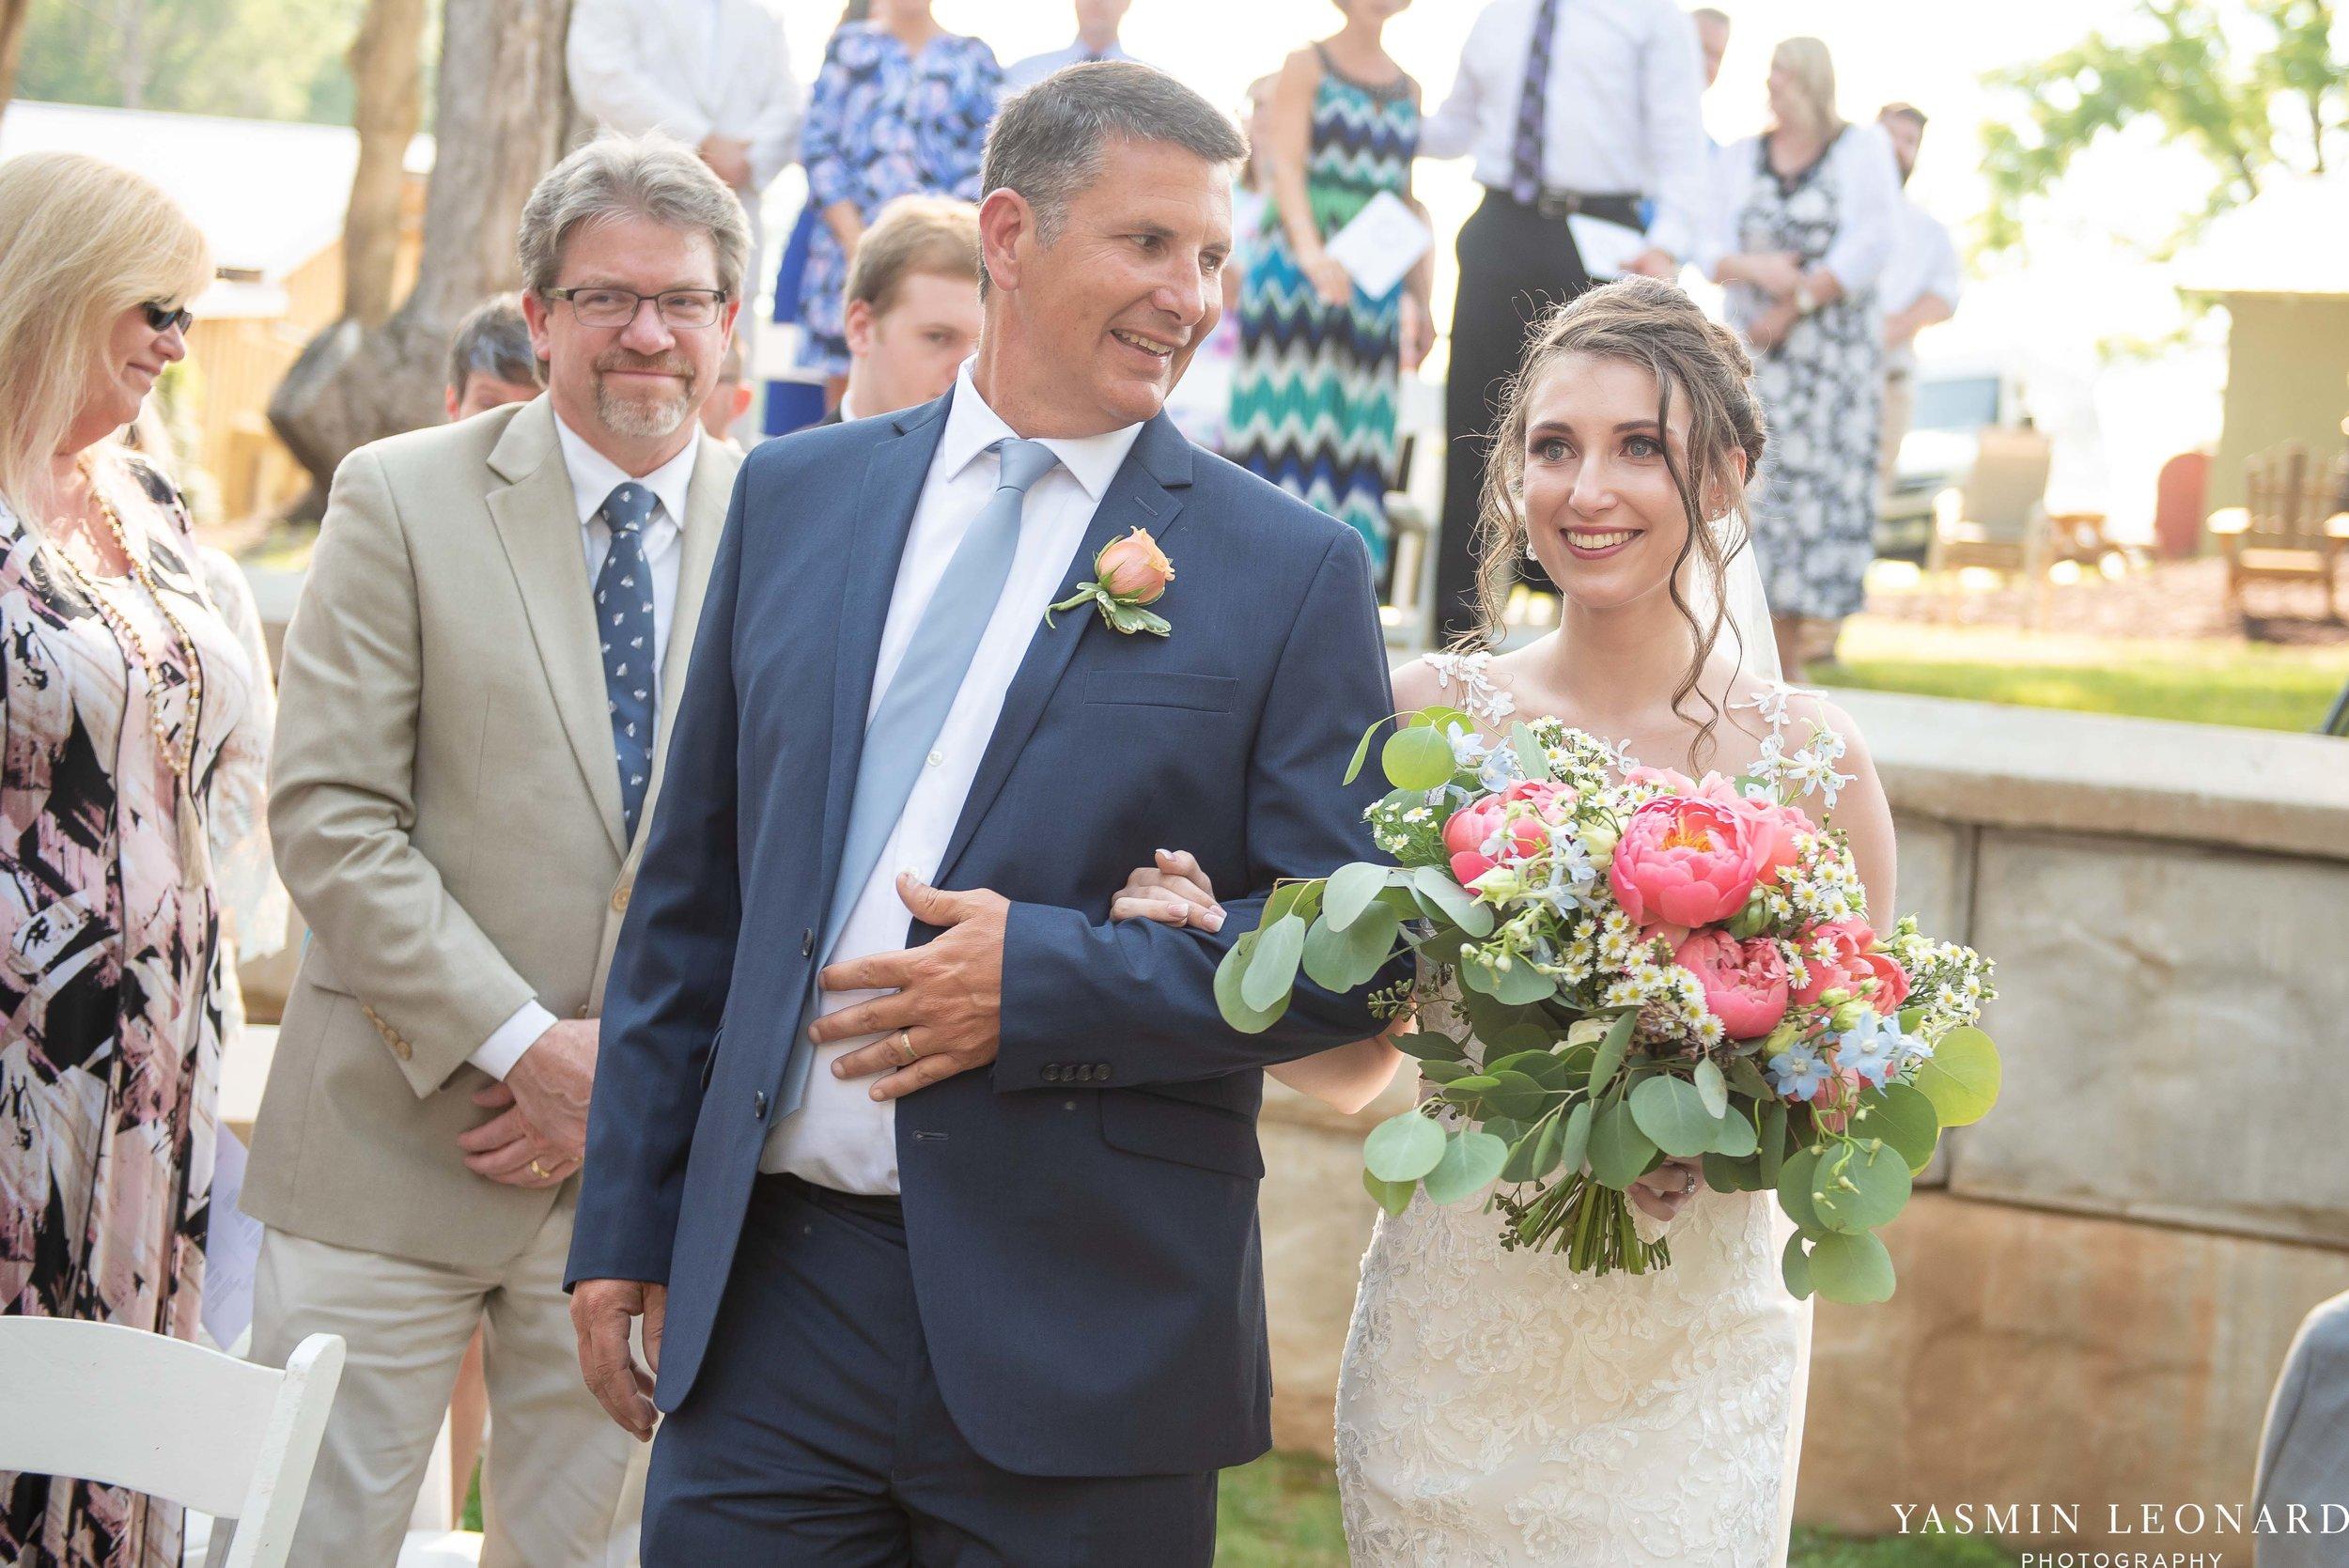 Old Homeplace Vineyard - NC Weddings - Outdoor Summer Weddings - Peony Boutique - Vineyard Wedding - NC Photographer - Yasmin Leonard Photography-28.jpg